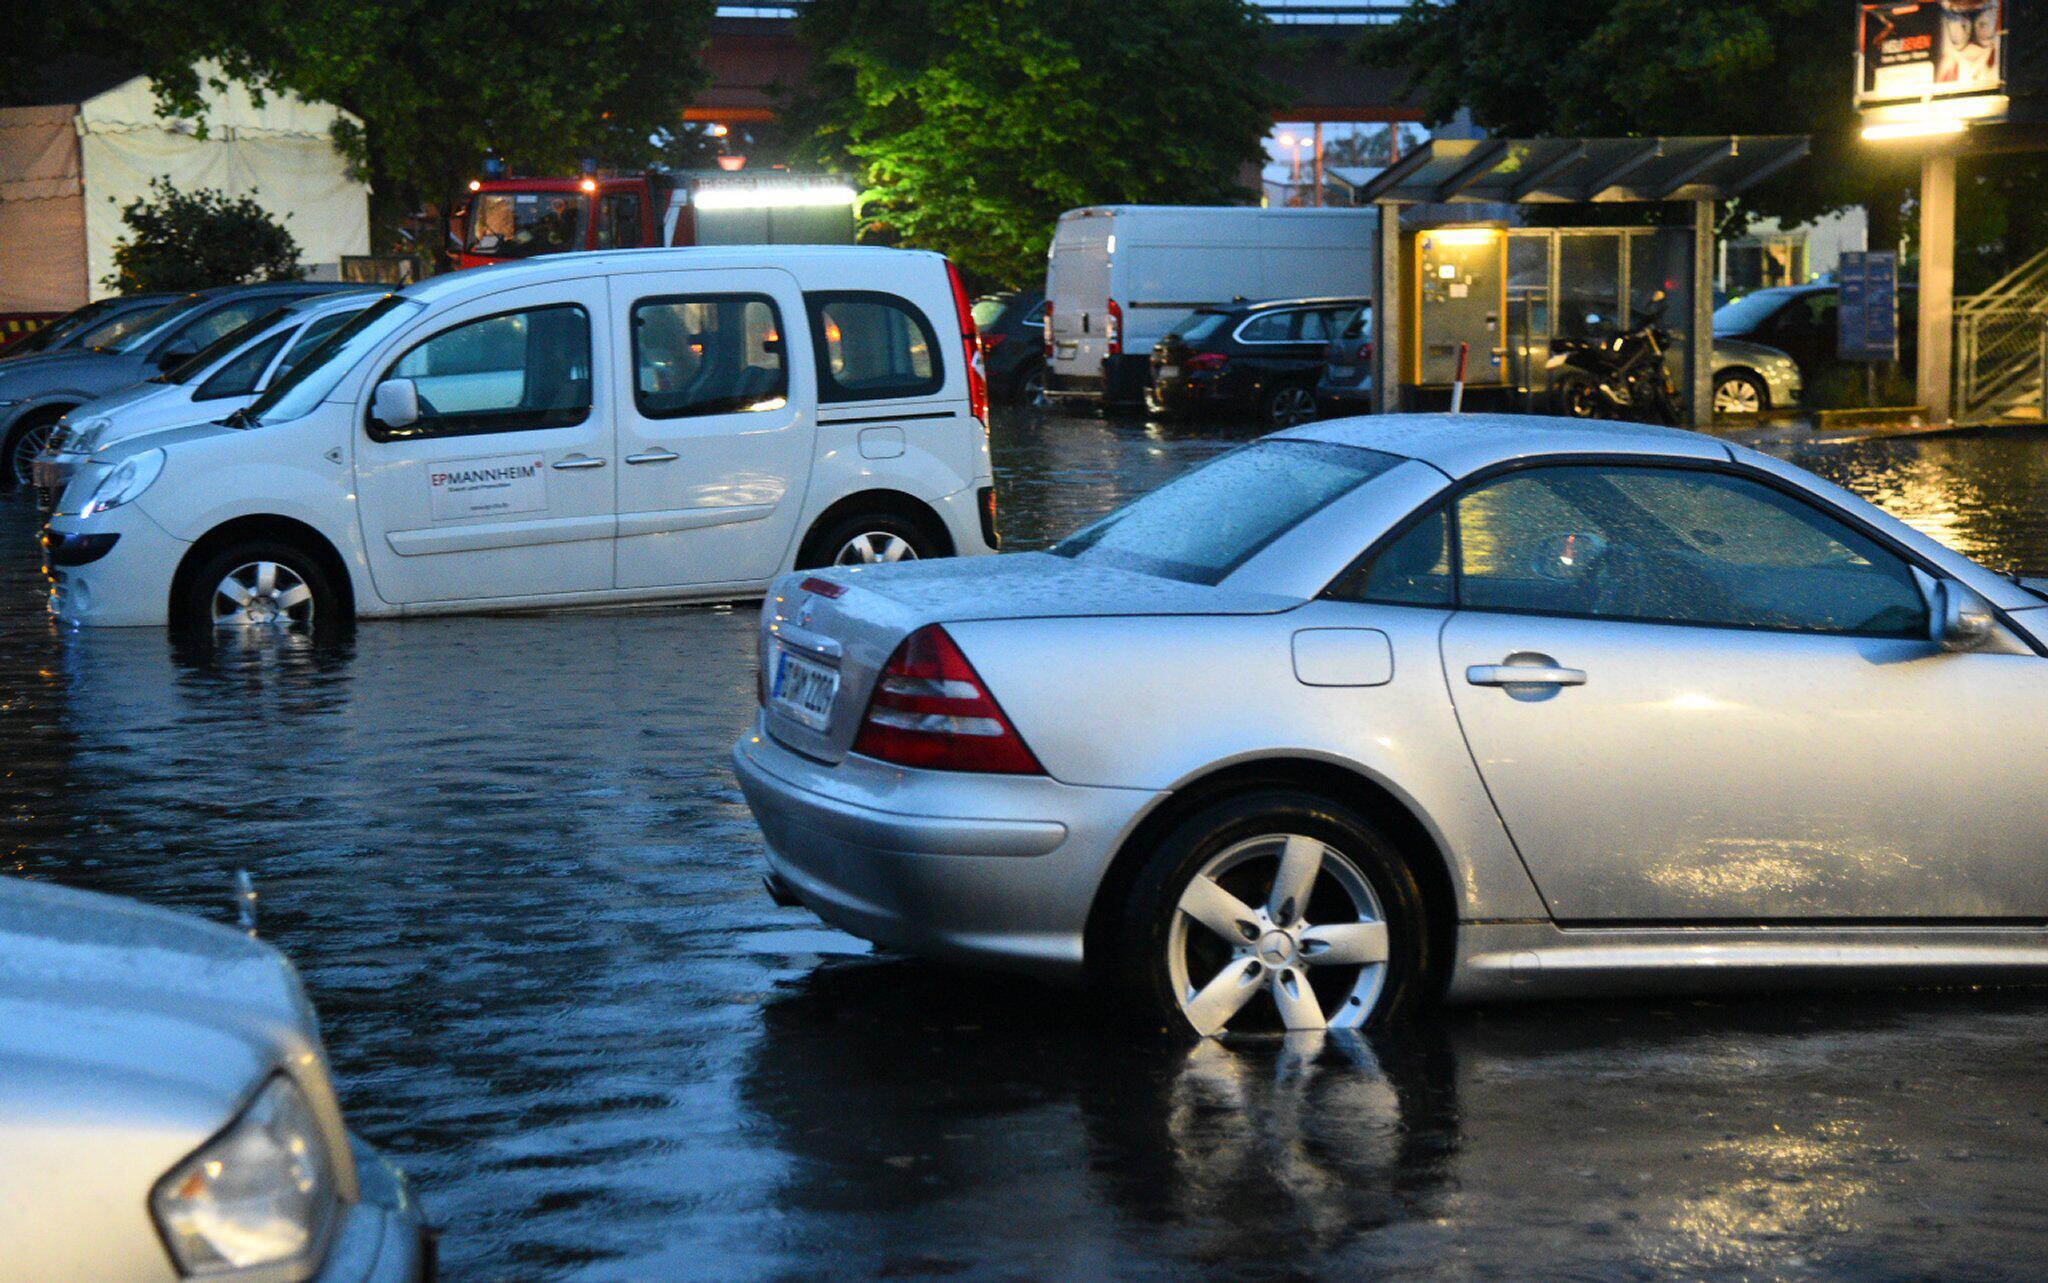 Bild zu Unwetter in Mannheim